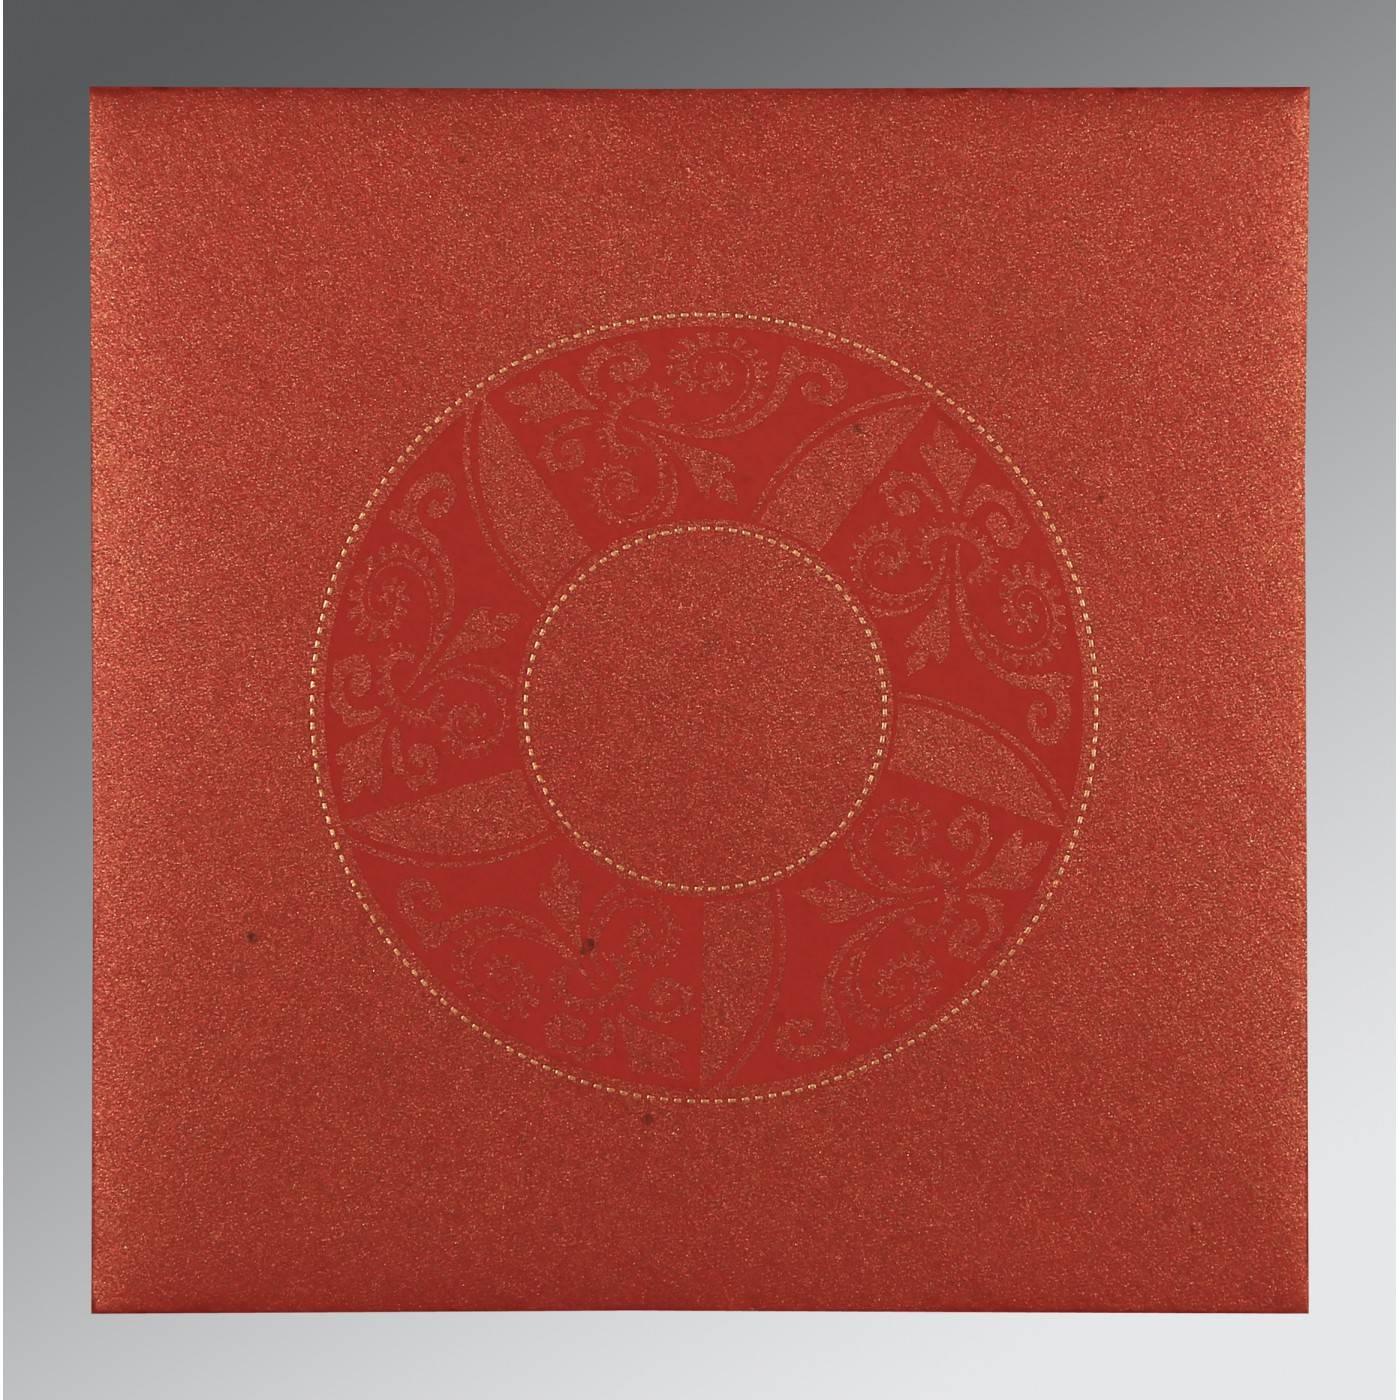 MAXICON RED SHIMMERY FLORAL THEMED - SCREEN PRINTED WEDDING CARD : CRU-8235C - IndianWeddingCards